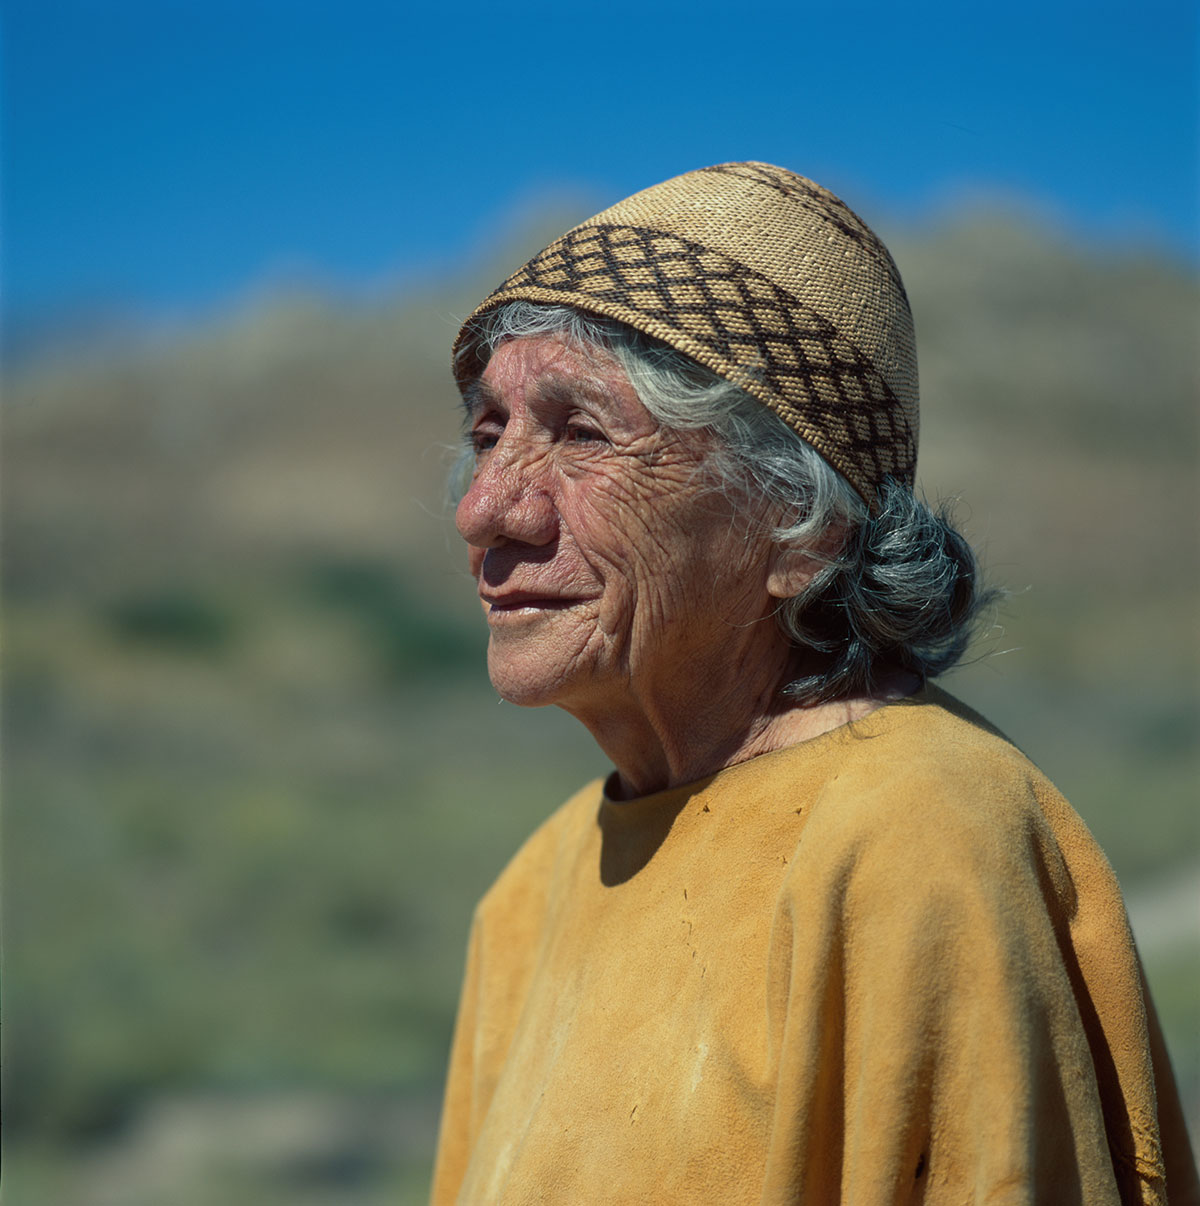 Native Americans - Paiute - Shoshone - Clara from Bigpine